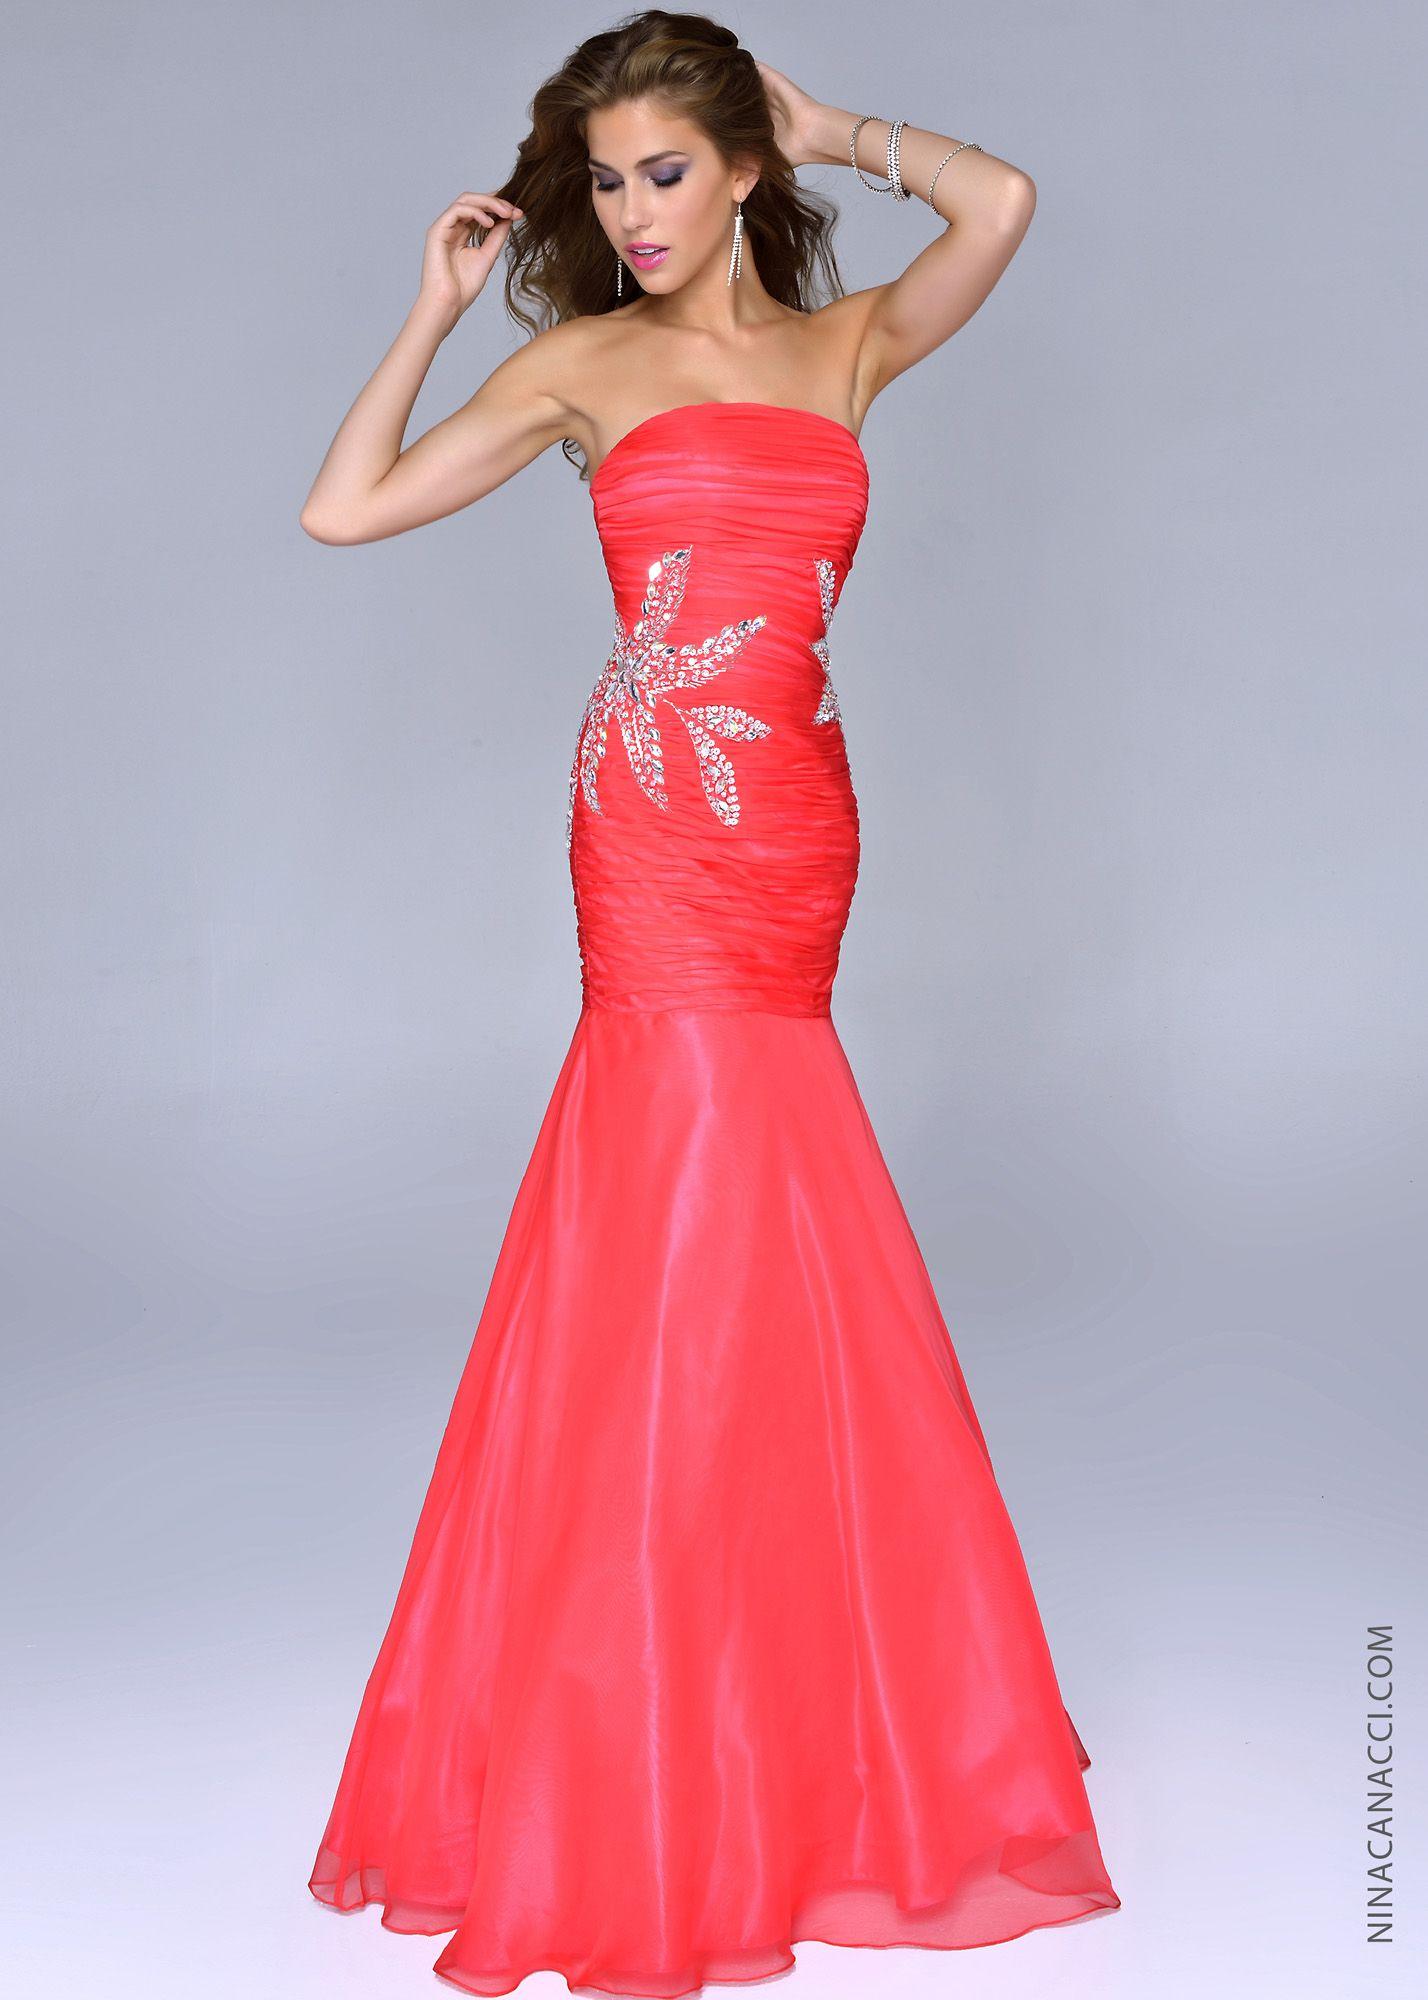 c8e2fef2044fd Nina Canacci 4019 -Watermelon Strapless Mermaid Prom Dresses Online  #thepromdresses